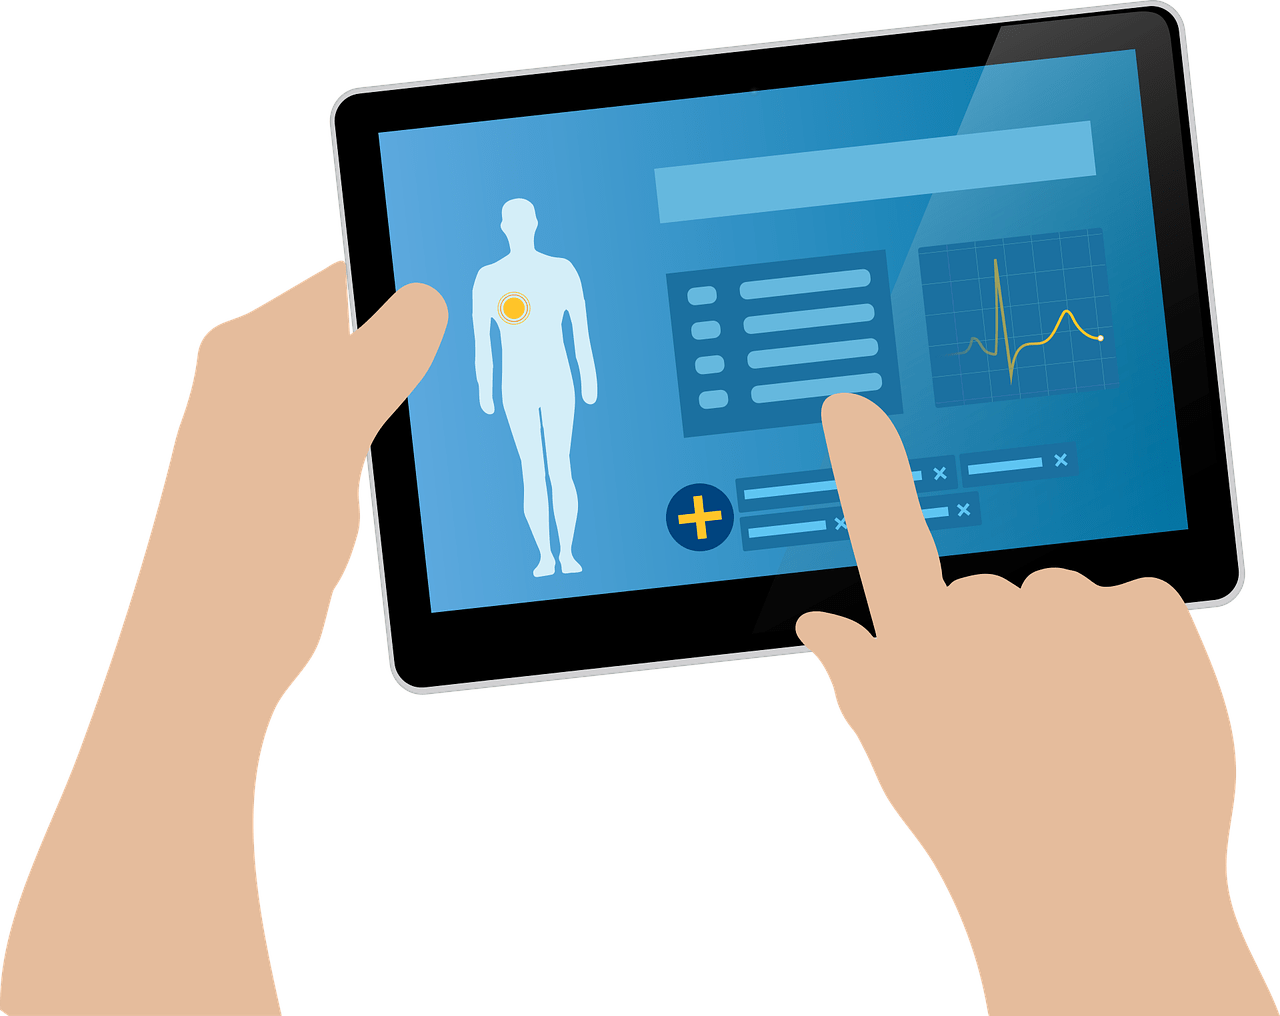 ehr, emr, electronic medical record